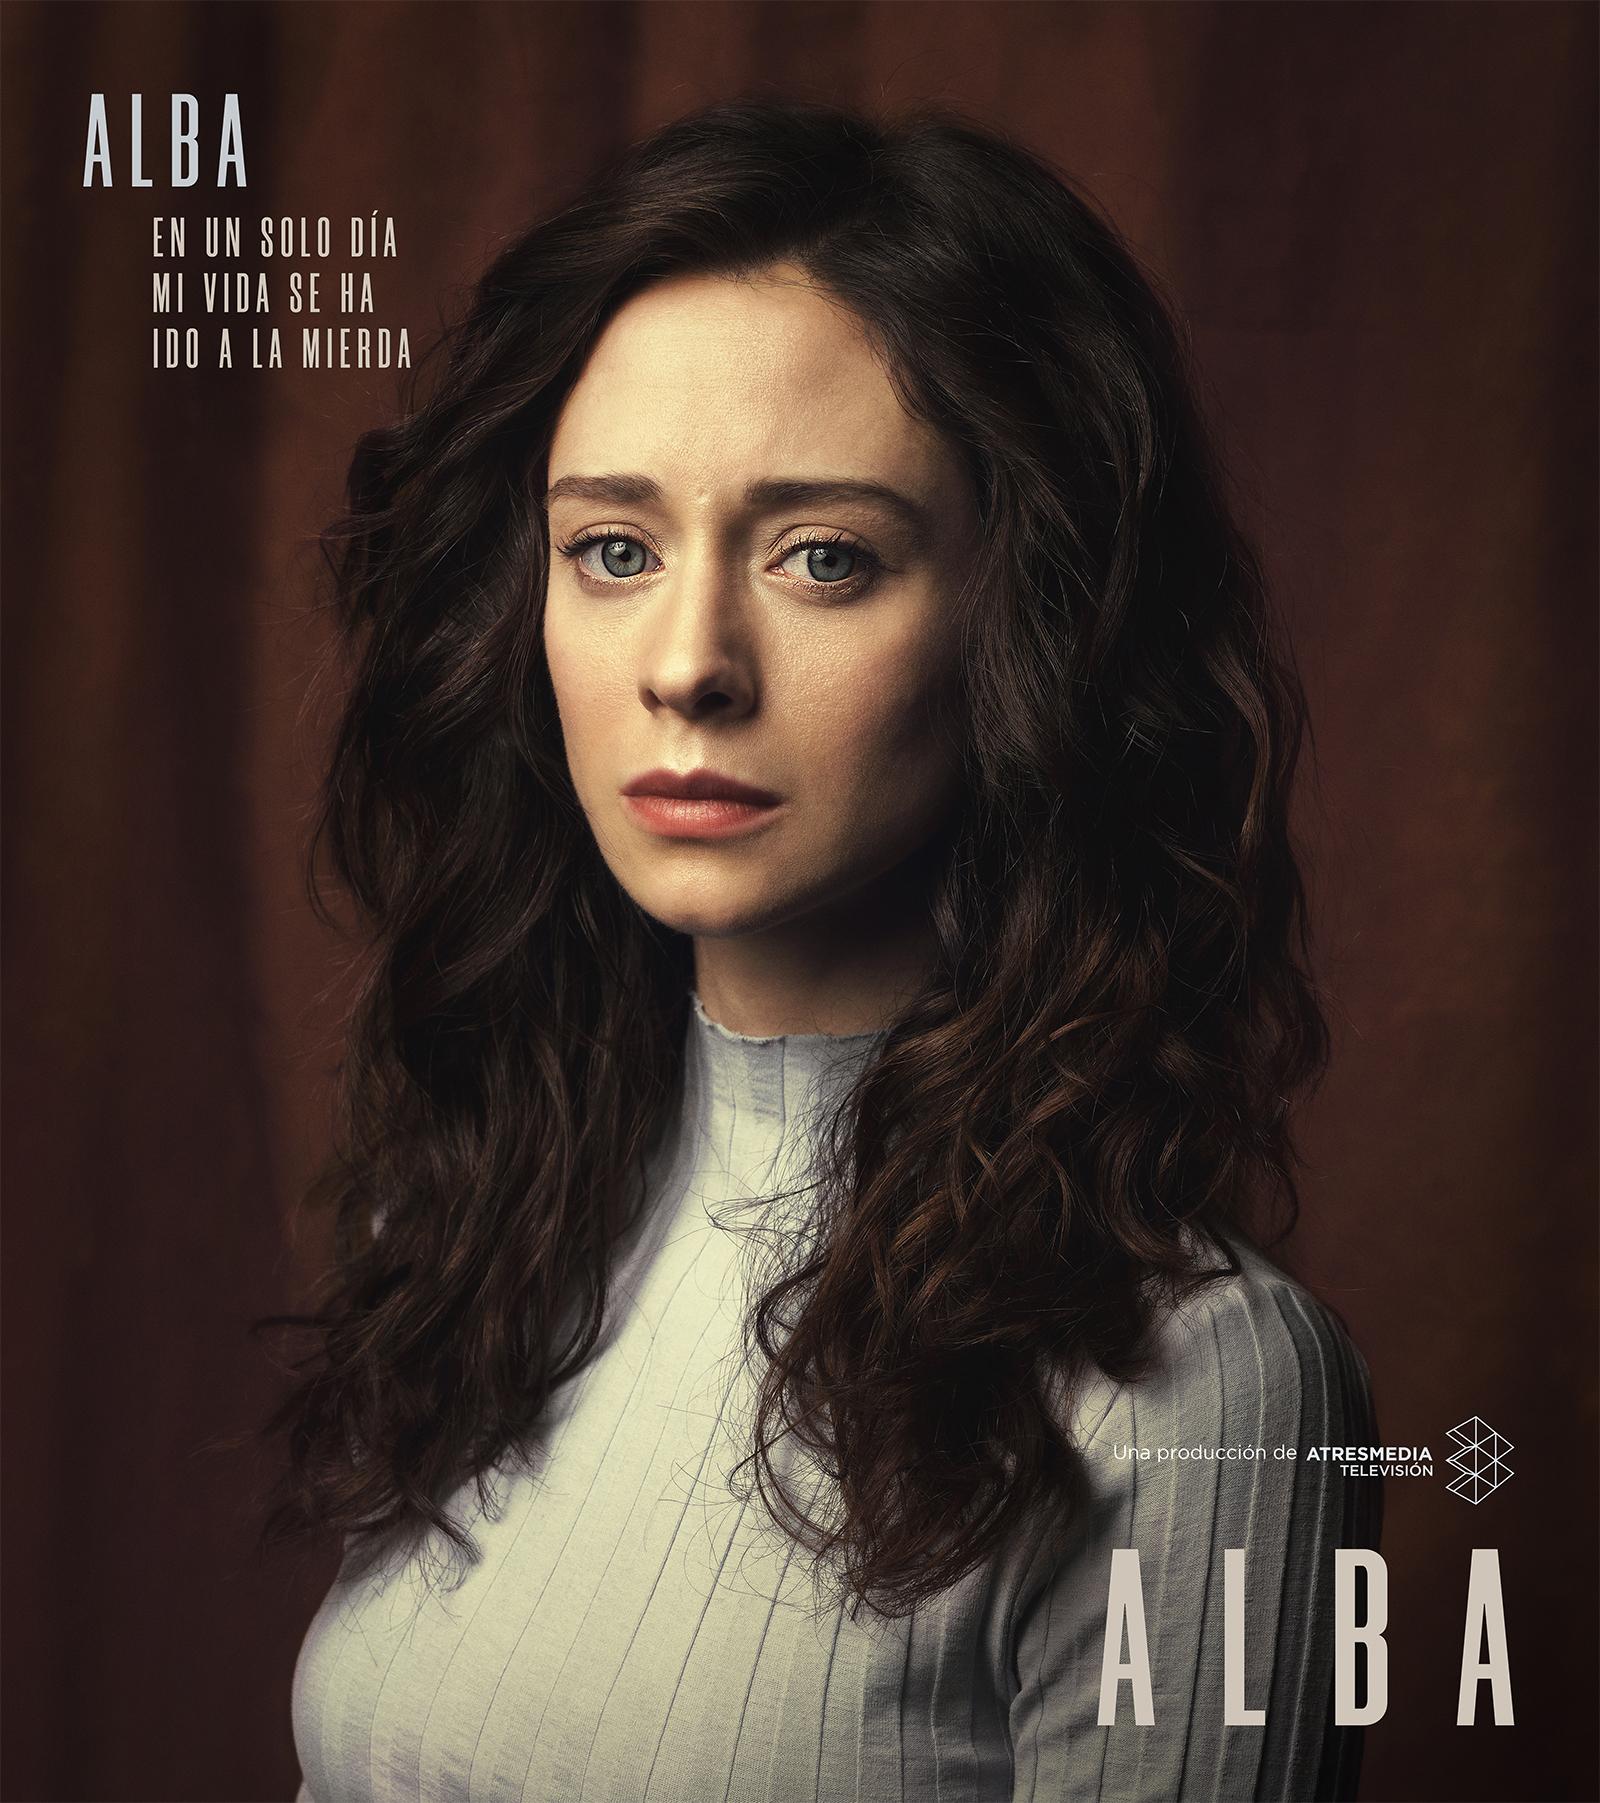 elena-rivera-alba-1x01